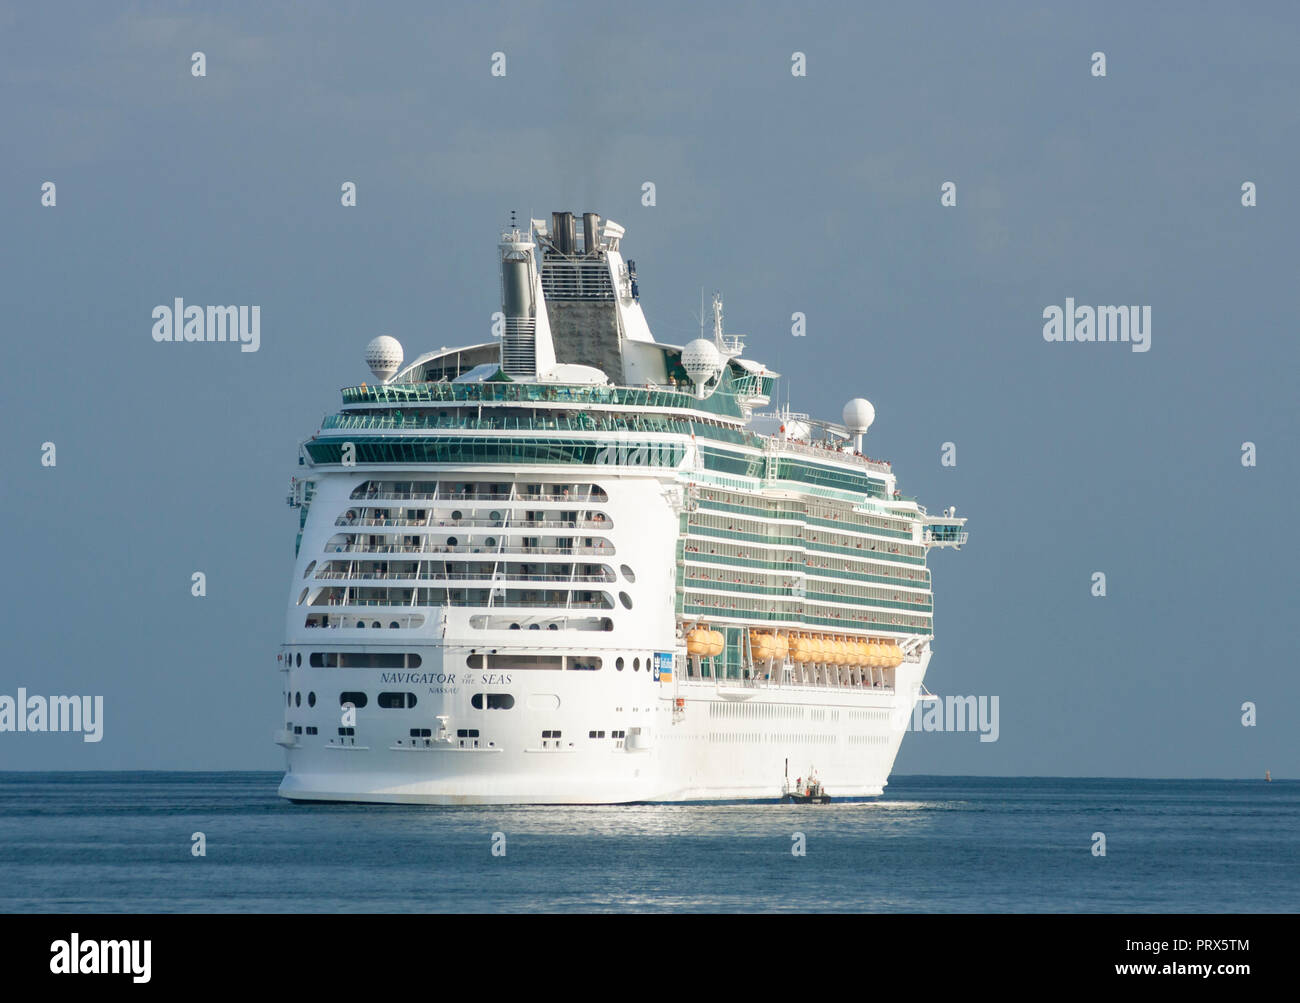 Large cruise (Navigator of the Seas) ship emitting black smoke from funnelNavigator of the Seas cruise ship. - Stock Image